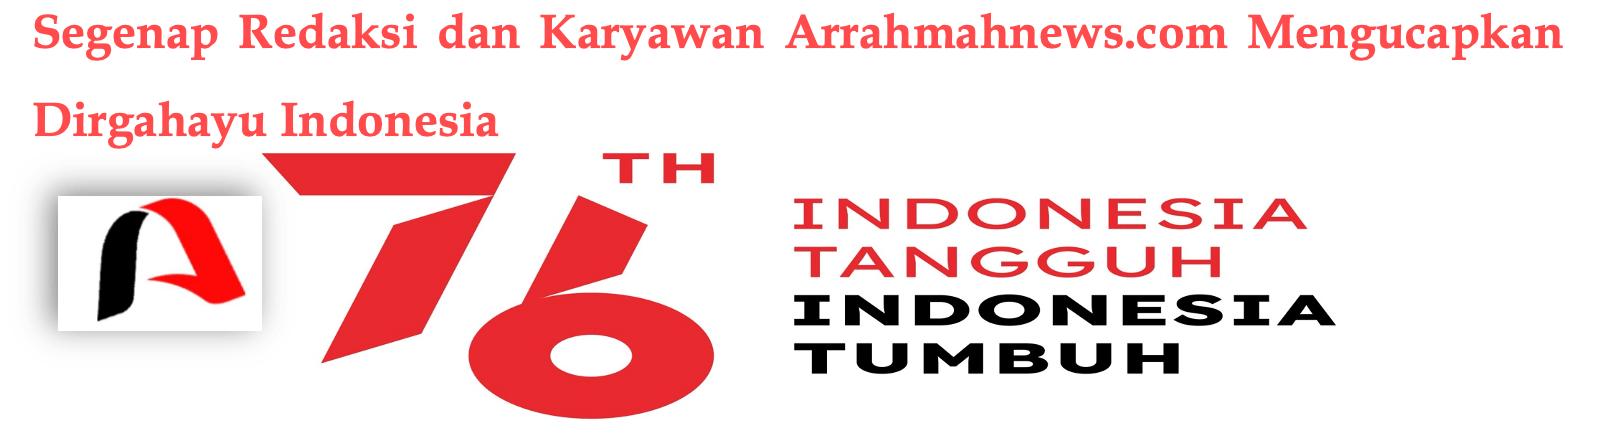 Drigahayu Indonesia 76 Tahun